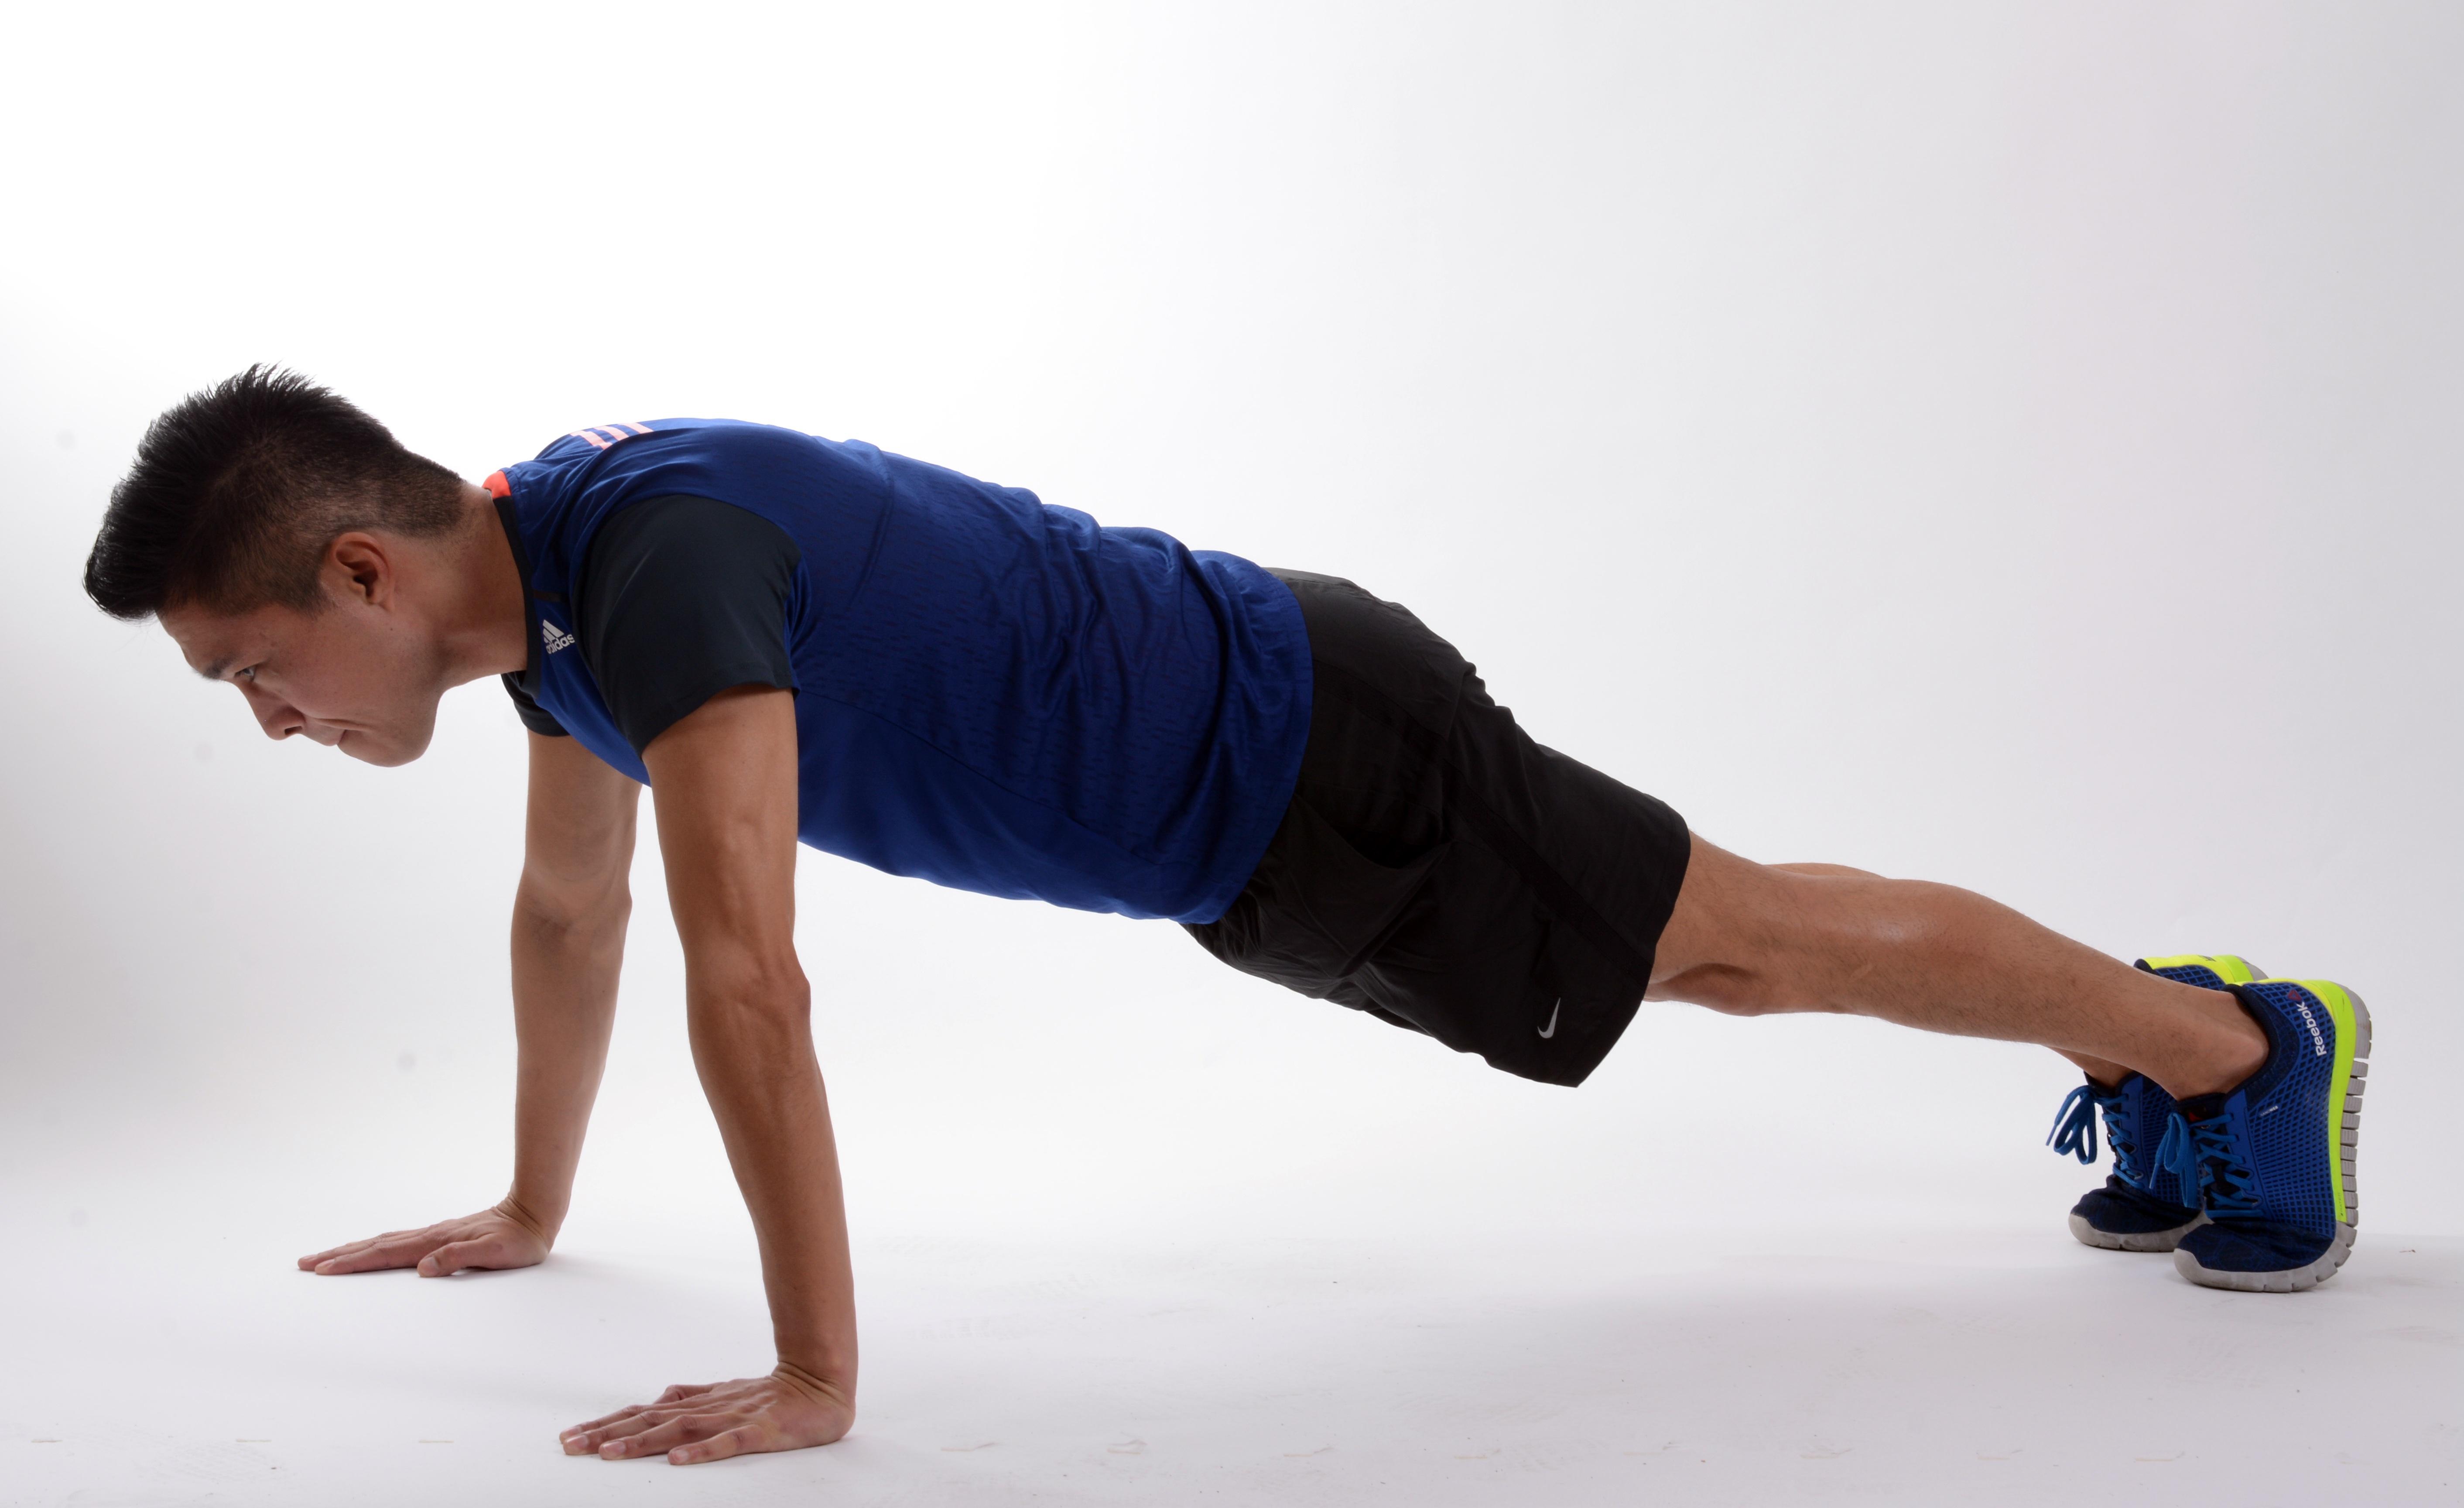 Exercise გაზრდის potency სურათები